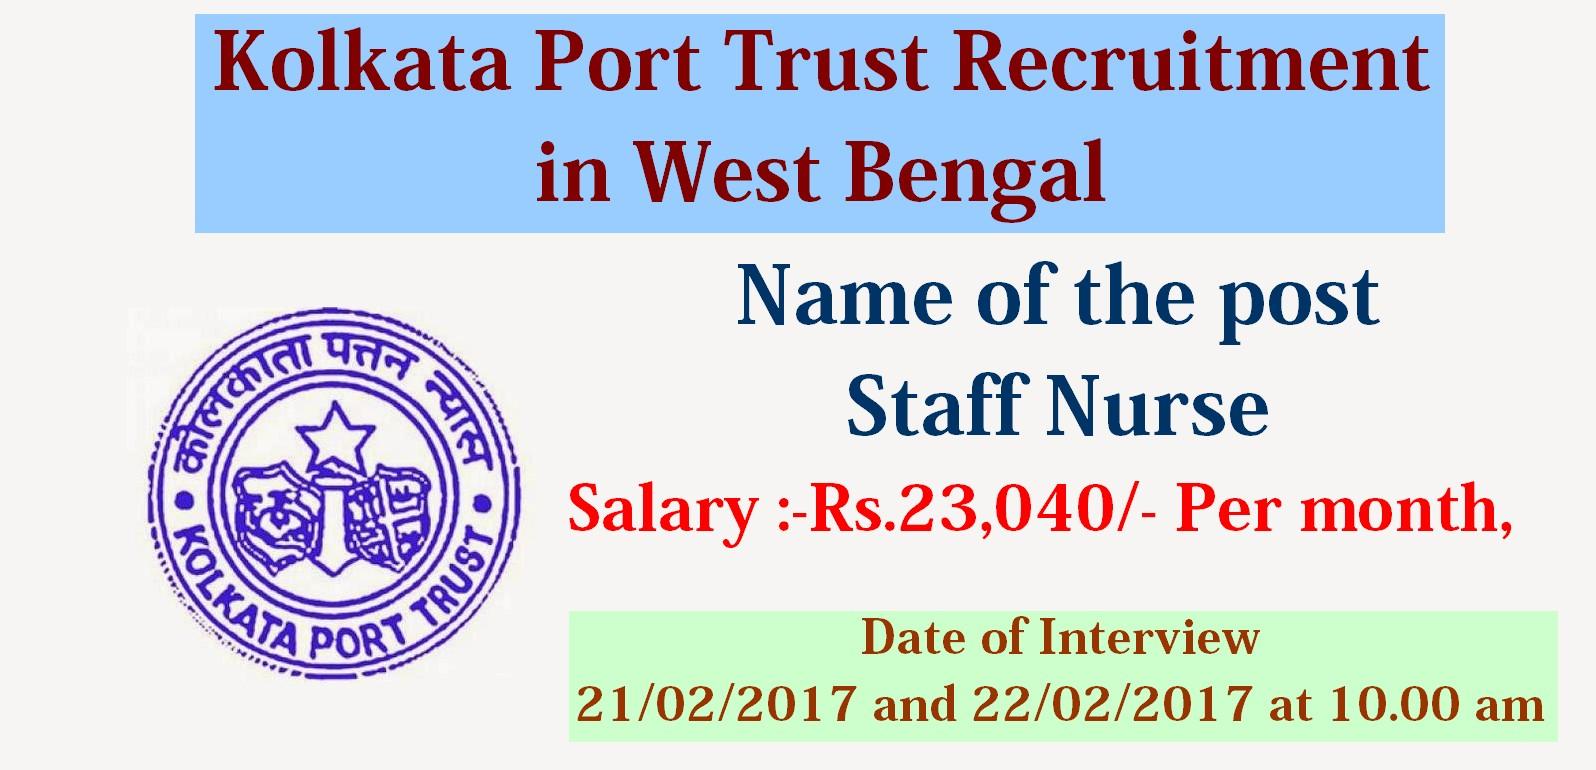 nurses job vacancy kolkata port trust recruitment staff nurse kolkata port trust recruitment staff nurse vacancy in west bengal